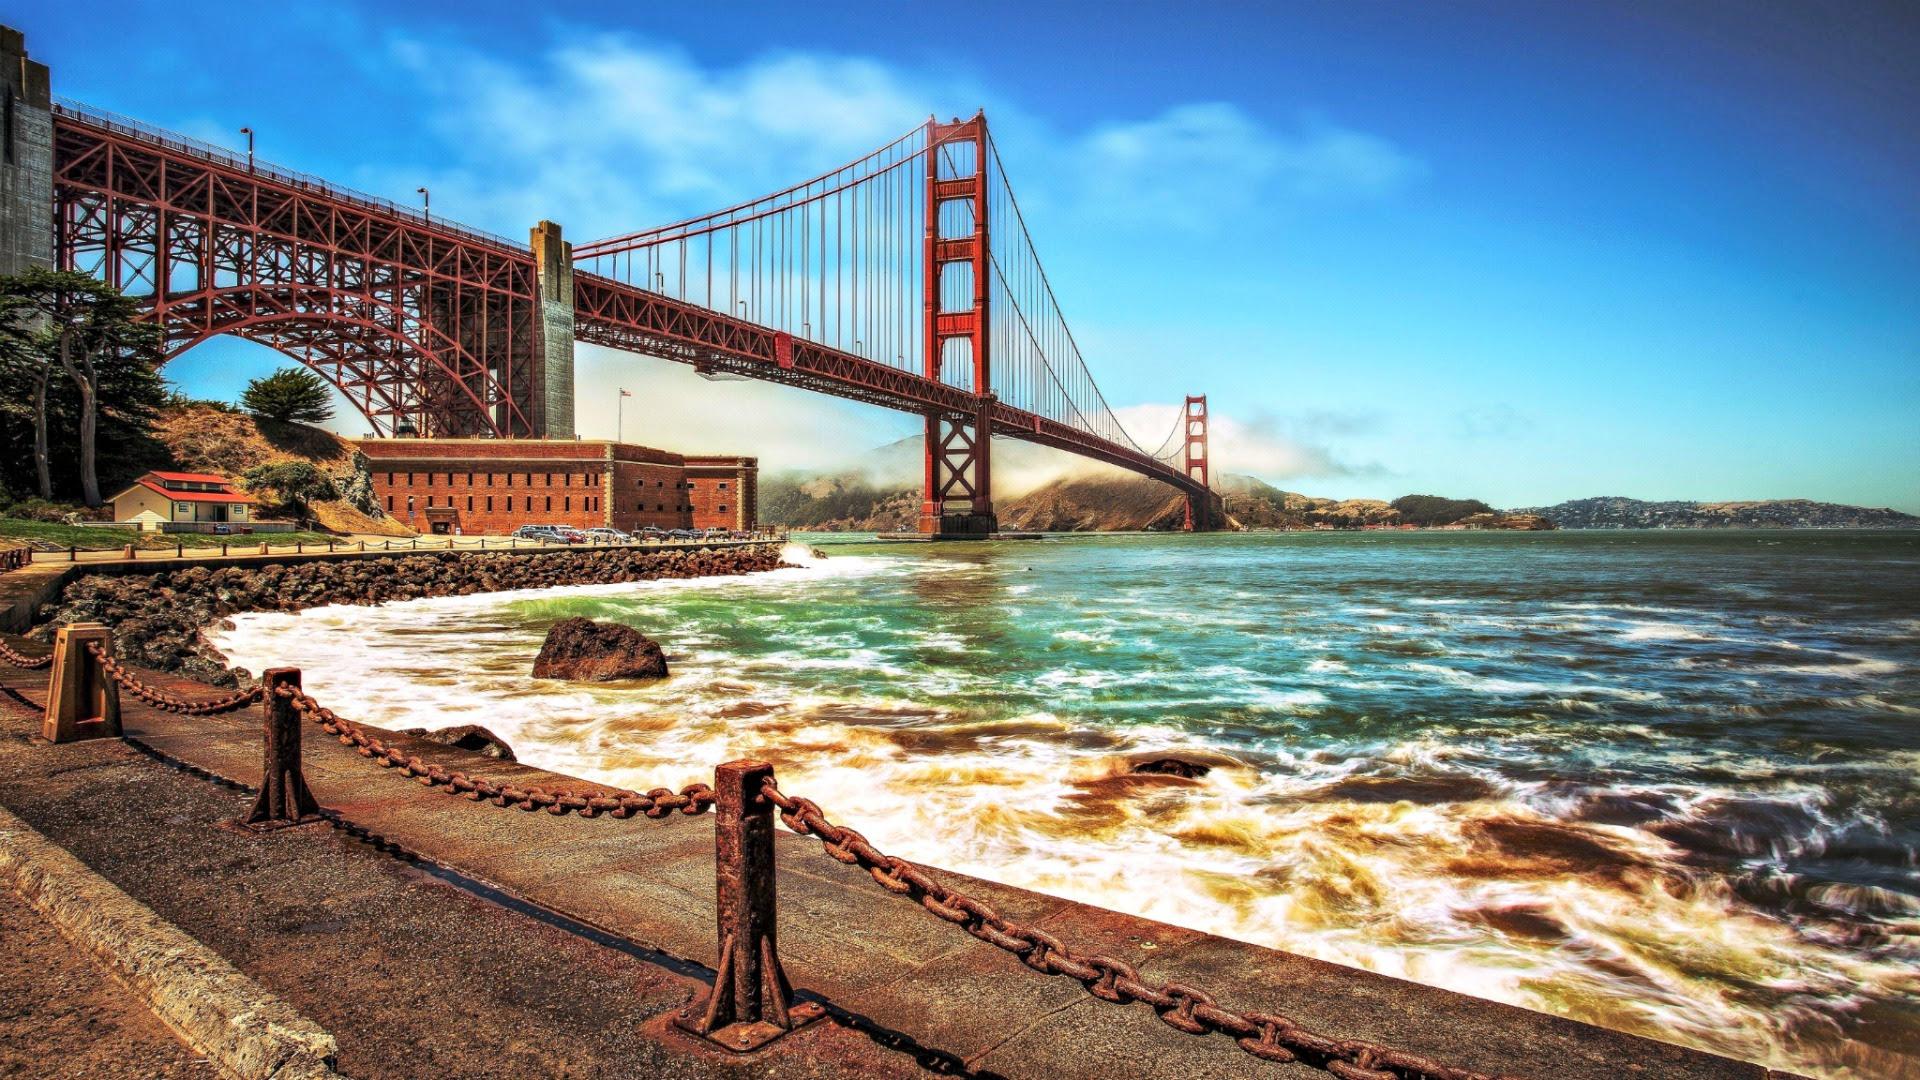 Golden Gate Bridge Iphone X Wallpaper